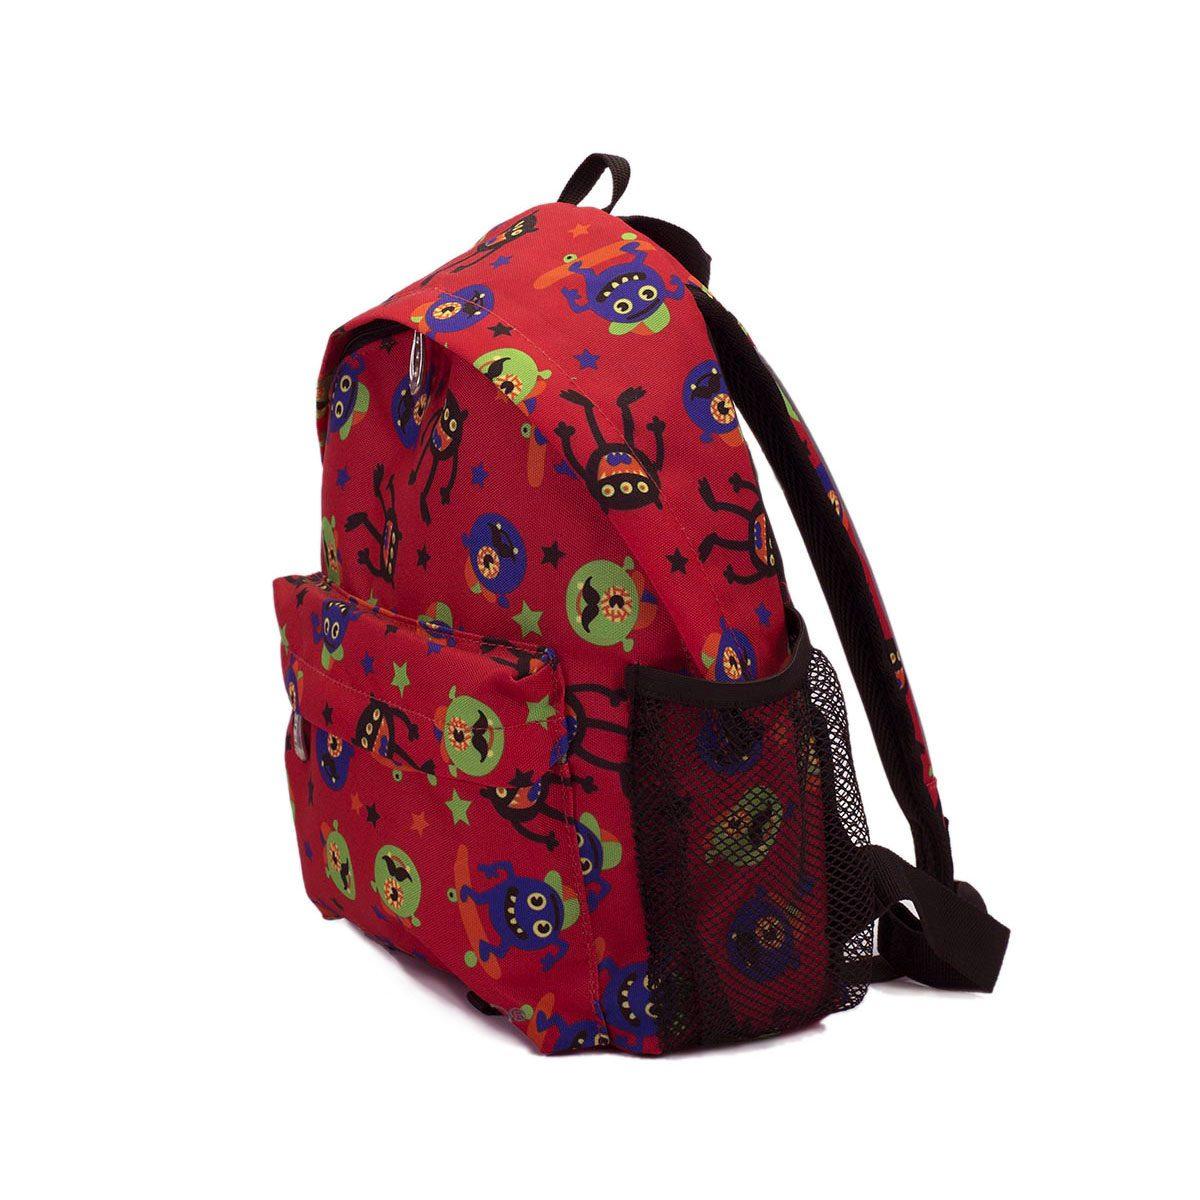 140ccfaa66e Σχολικό Σακίδιο Πλάτης Νηπιαγωγείου Polo Backpack Mini 9-01-067-63 Κόκκινο